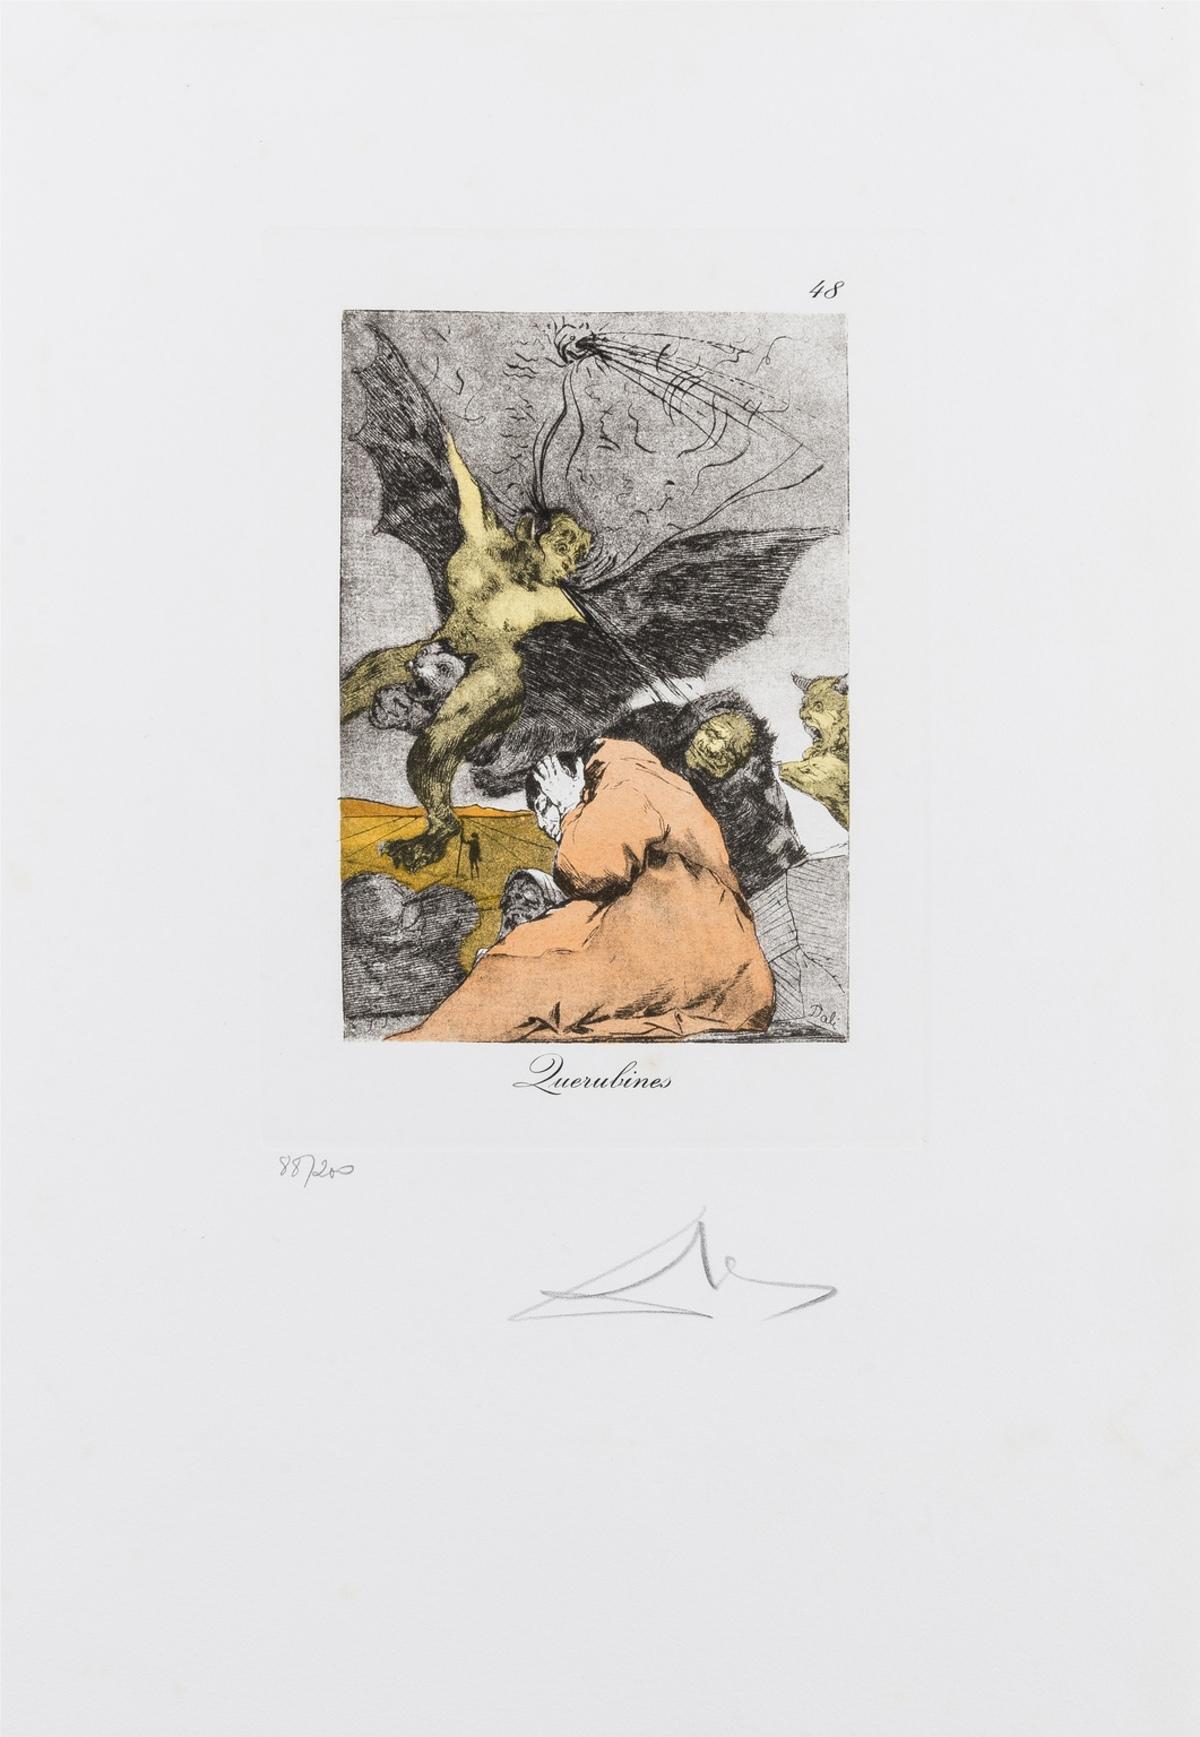 Salvador Dalí (1904-1989) Querubines (Field 77-3-32)